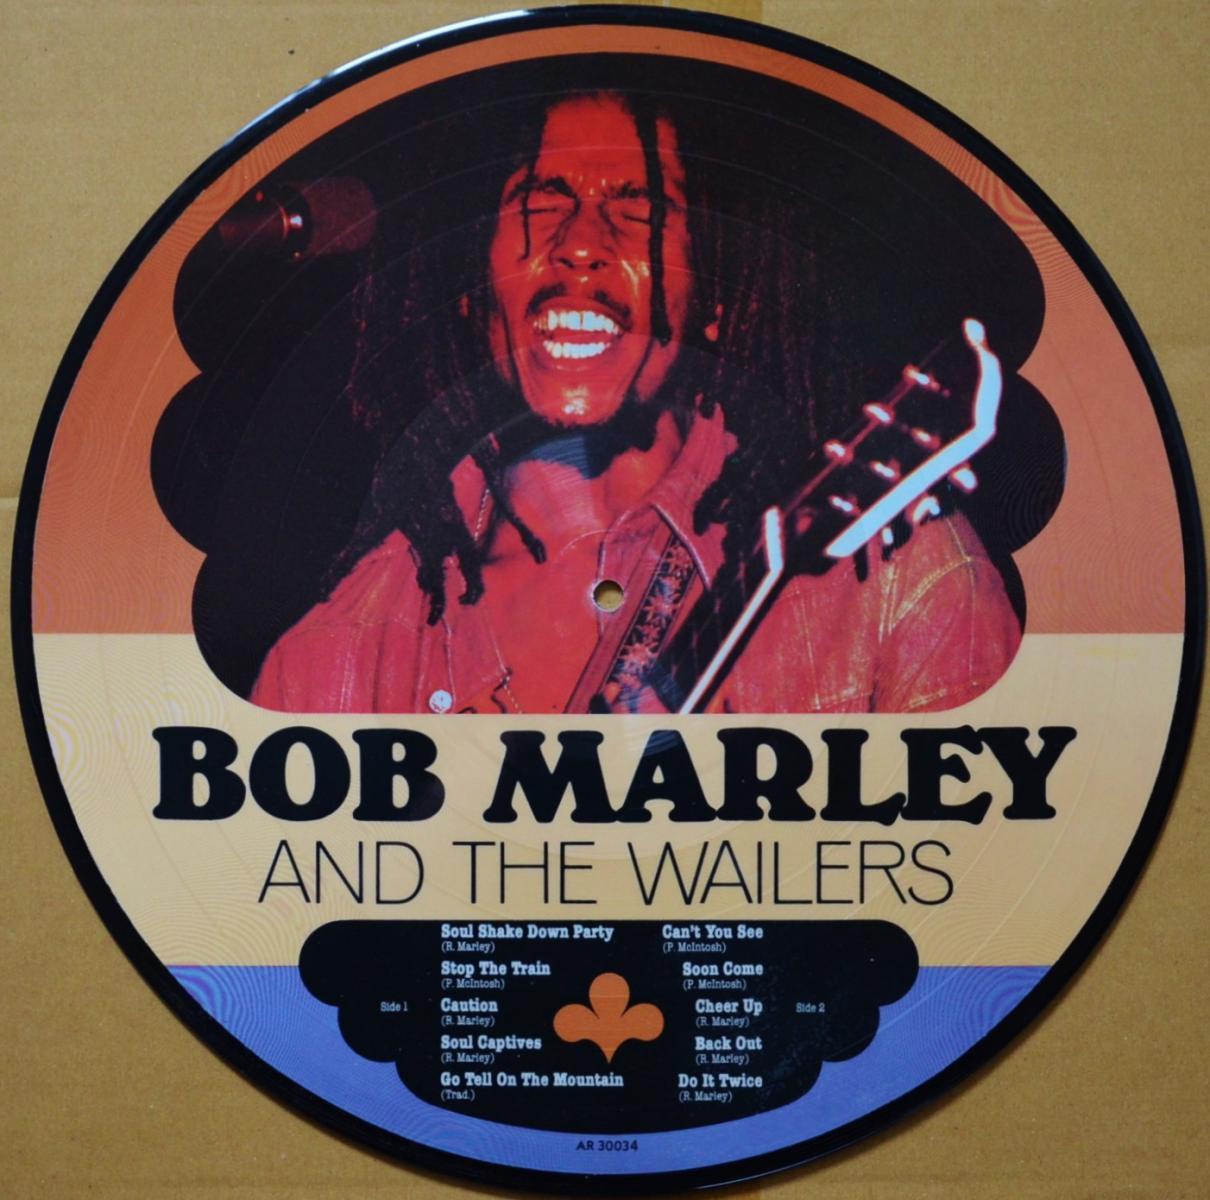 BOB MARLEY & THE WAILERS / BOB MARLEY AND THE WAILERS (LP)